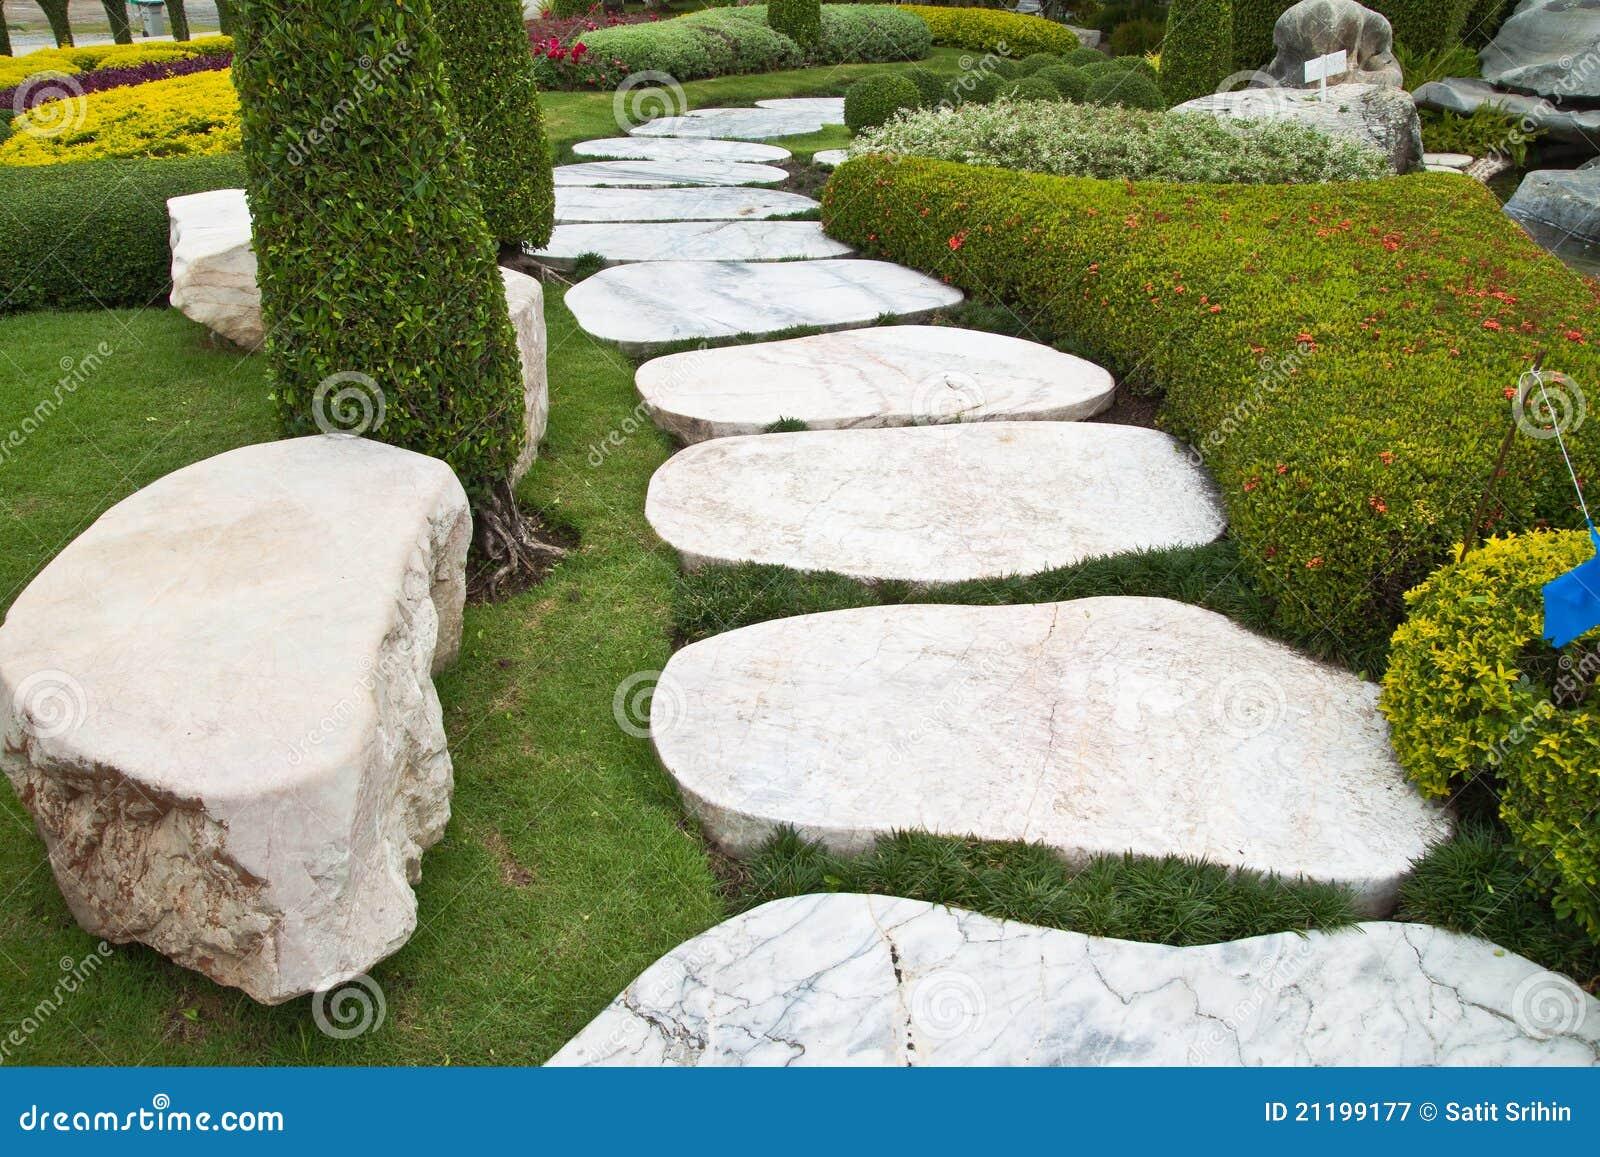 Seat and stone walkway